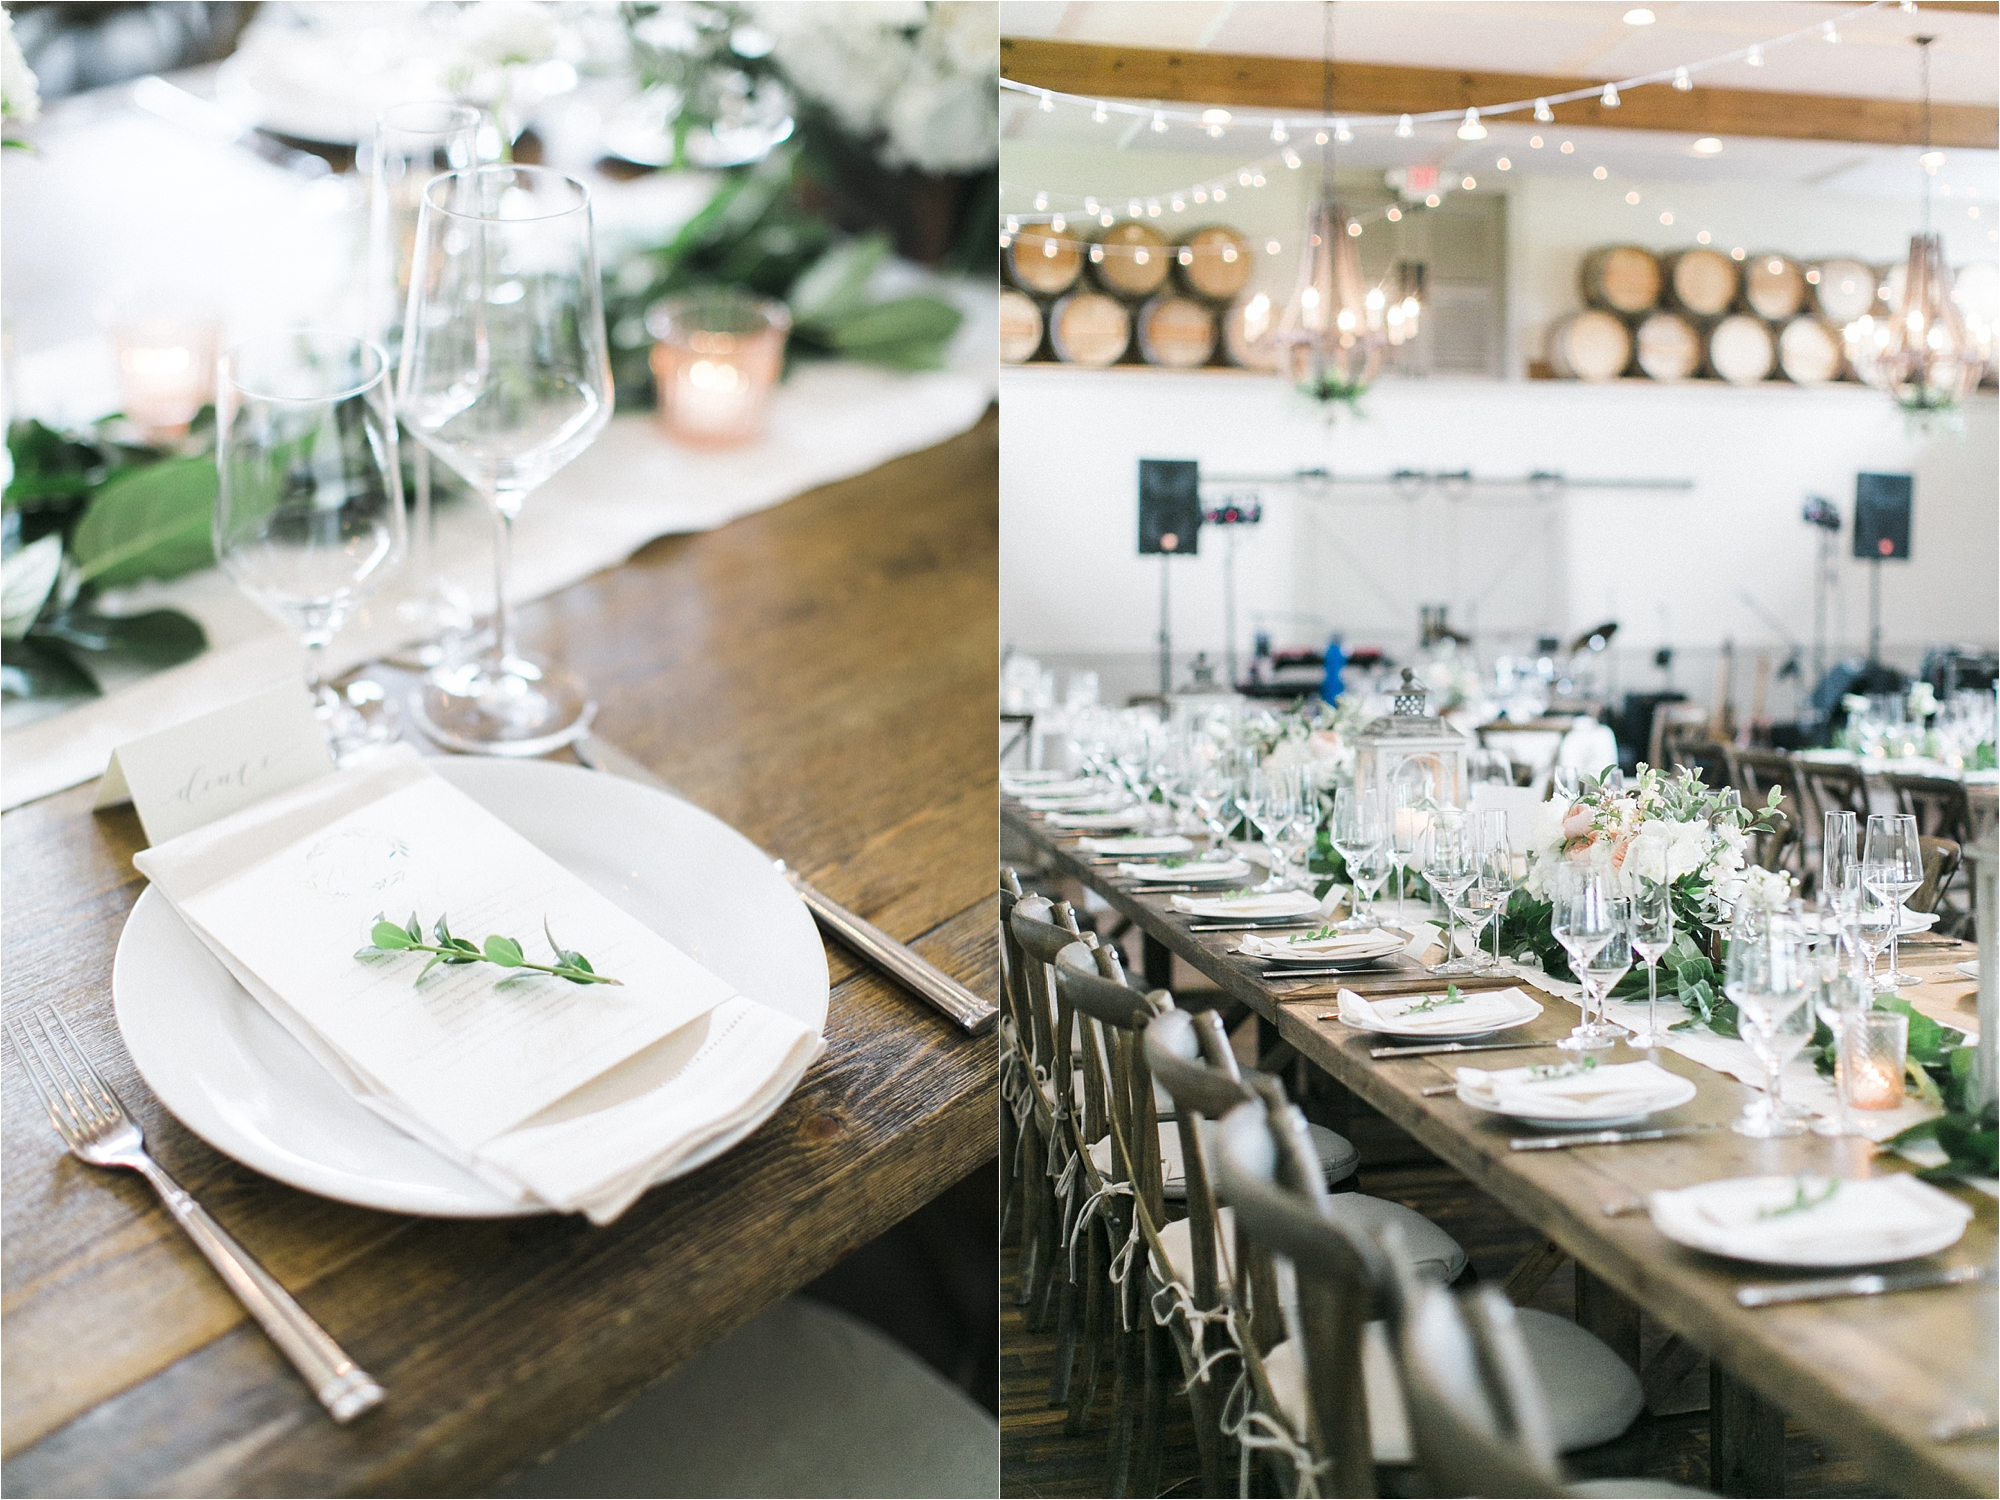 stephanie-yonce-charlottesville-virginia-king-family-vineyard-wedding-photos_0041.jpg